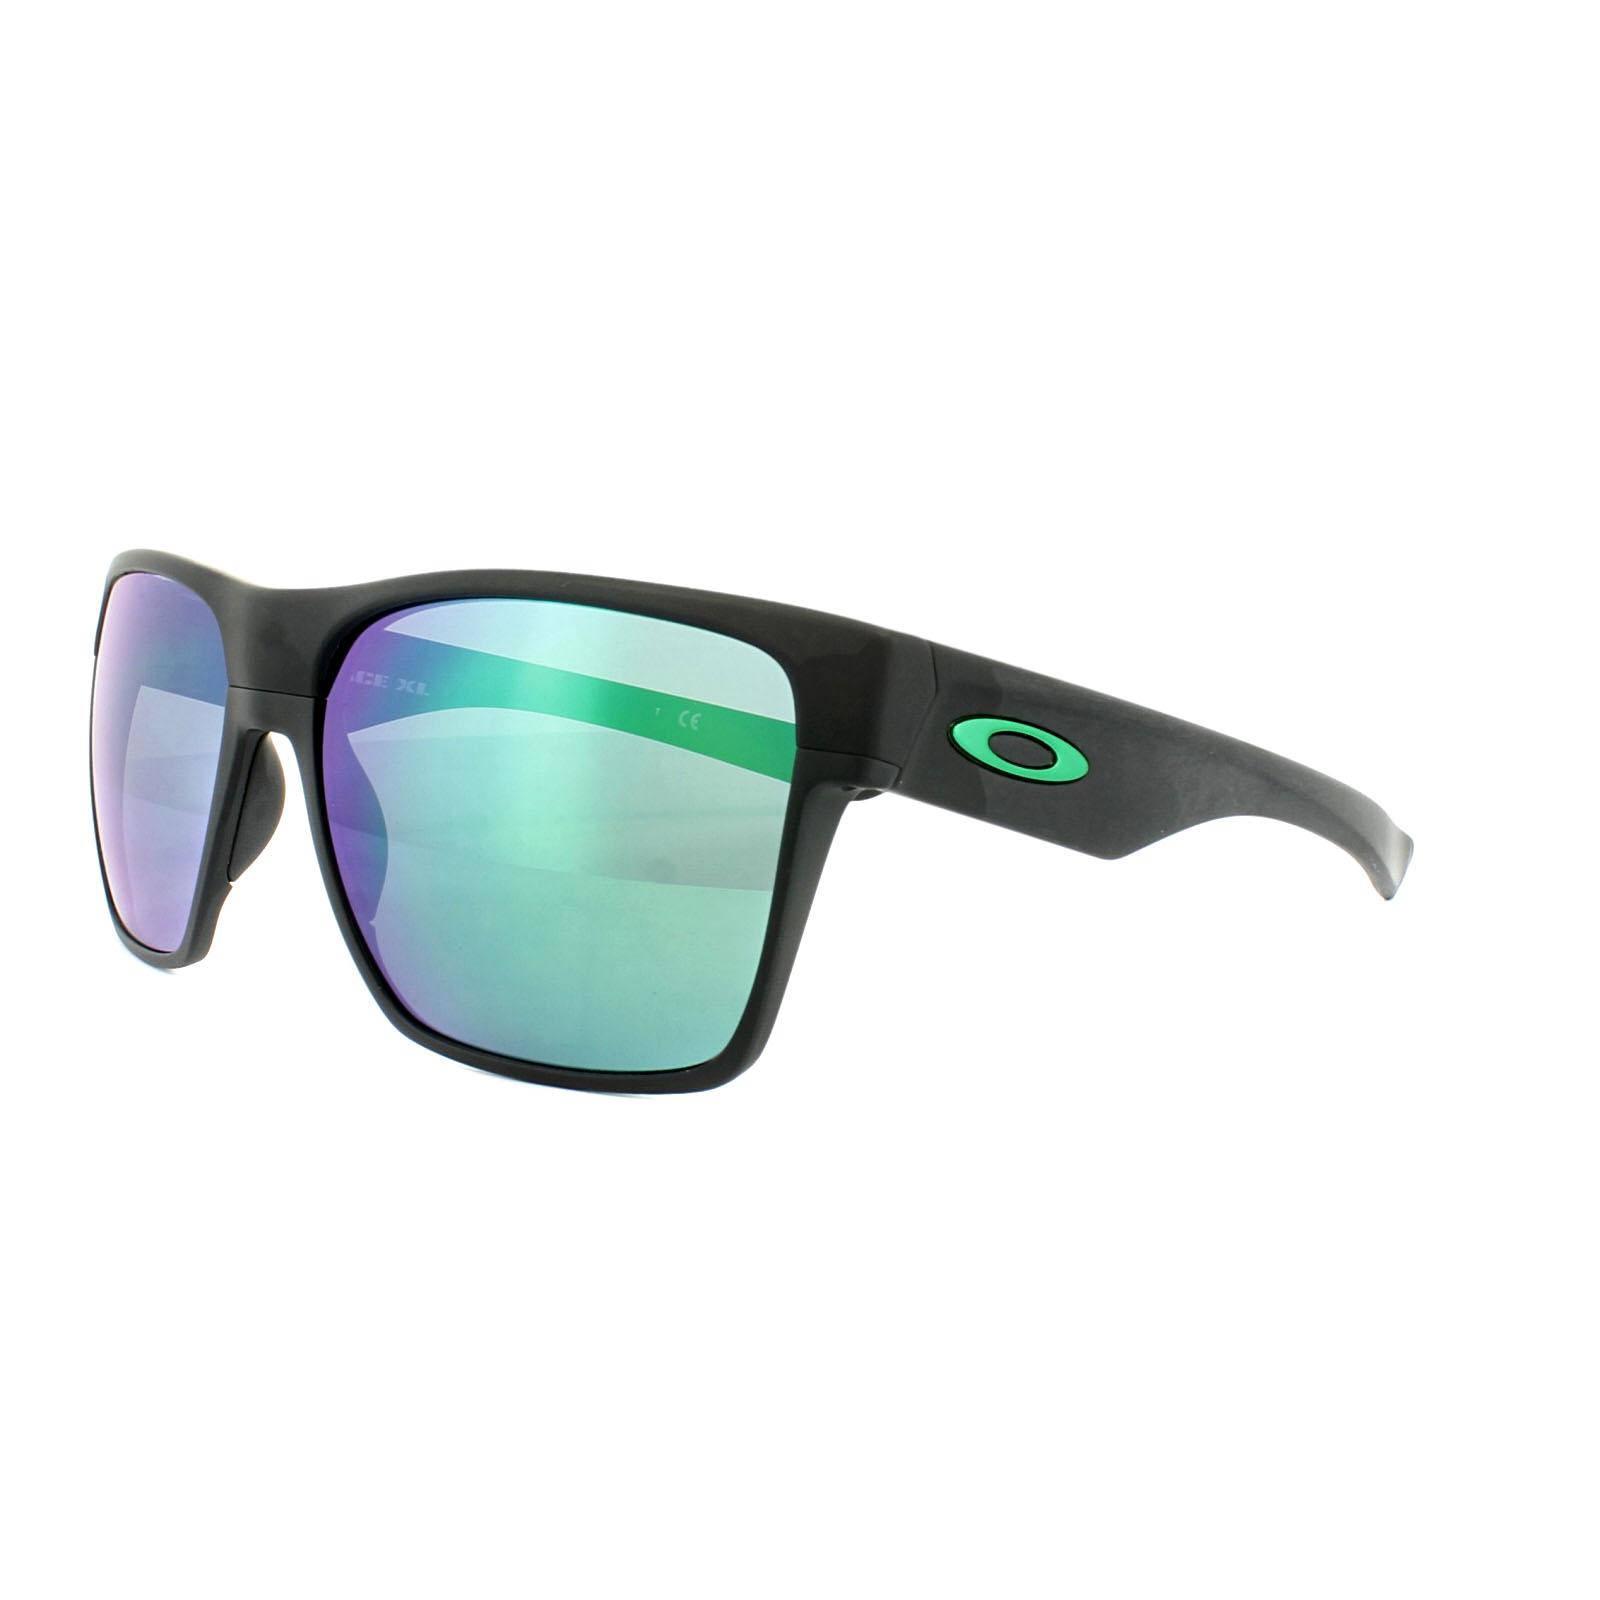 5322e7579b6 Sentinel Oakley Sunglasses TwoFace XL OO9350-08 Matt Black Jade Iridium